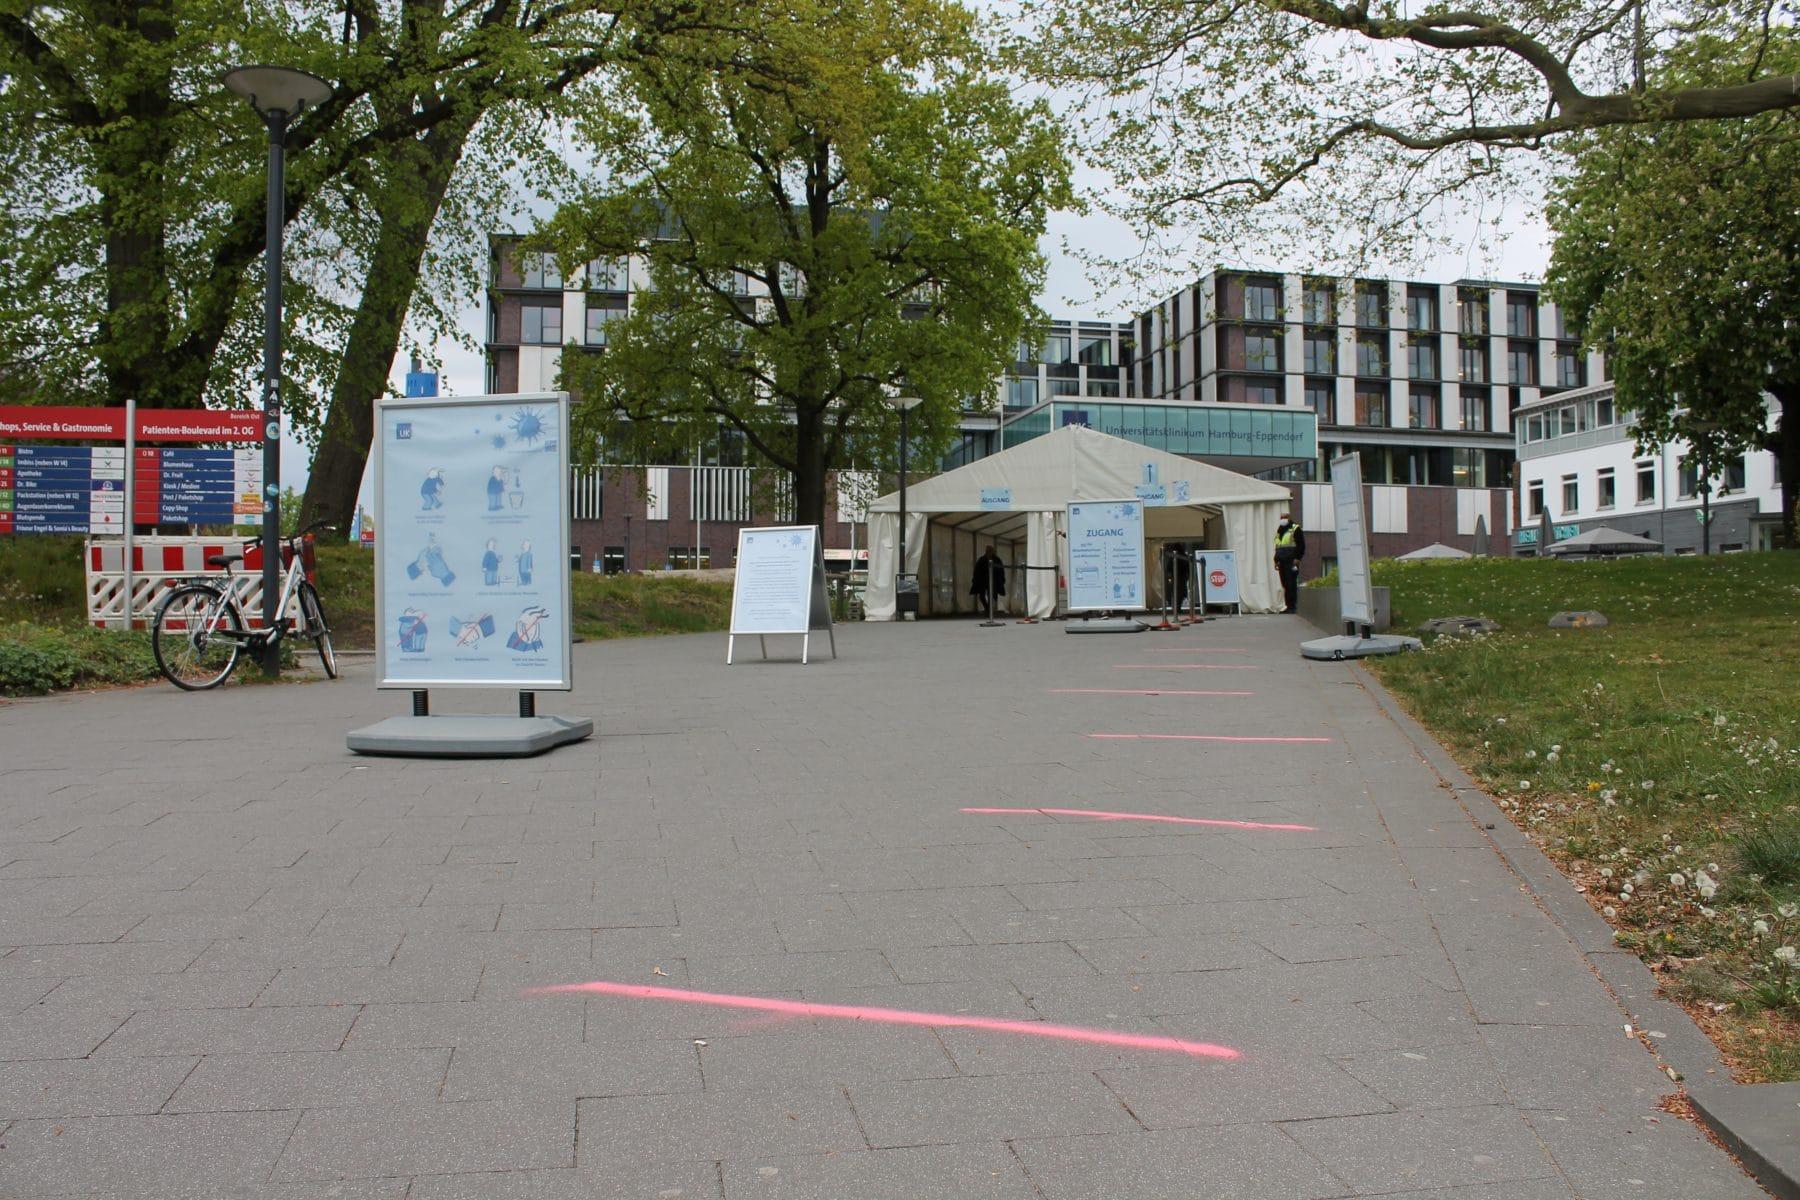 Impfstoff Corona UKE Hamburg